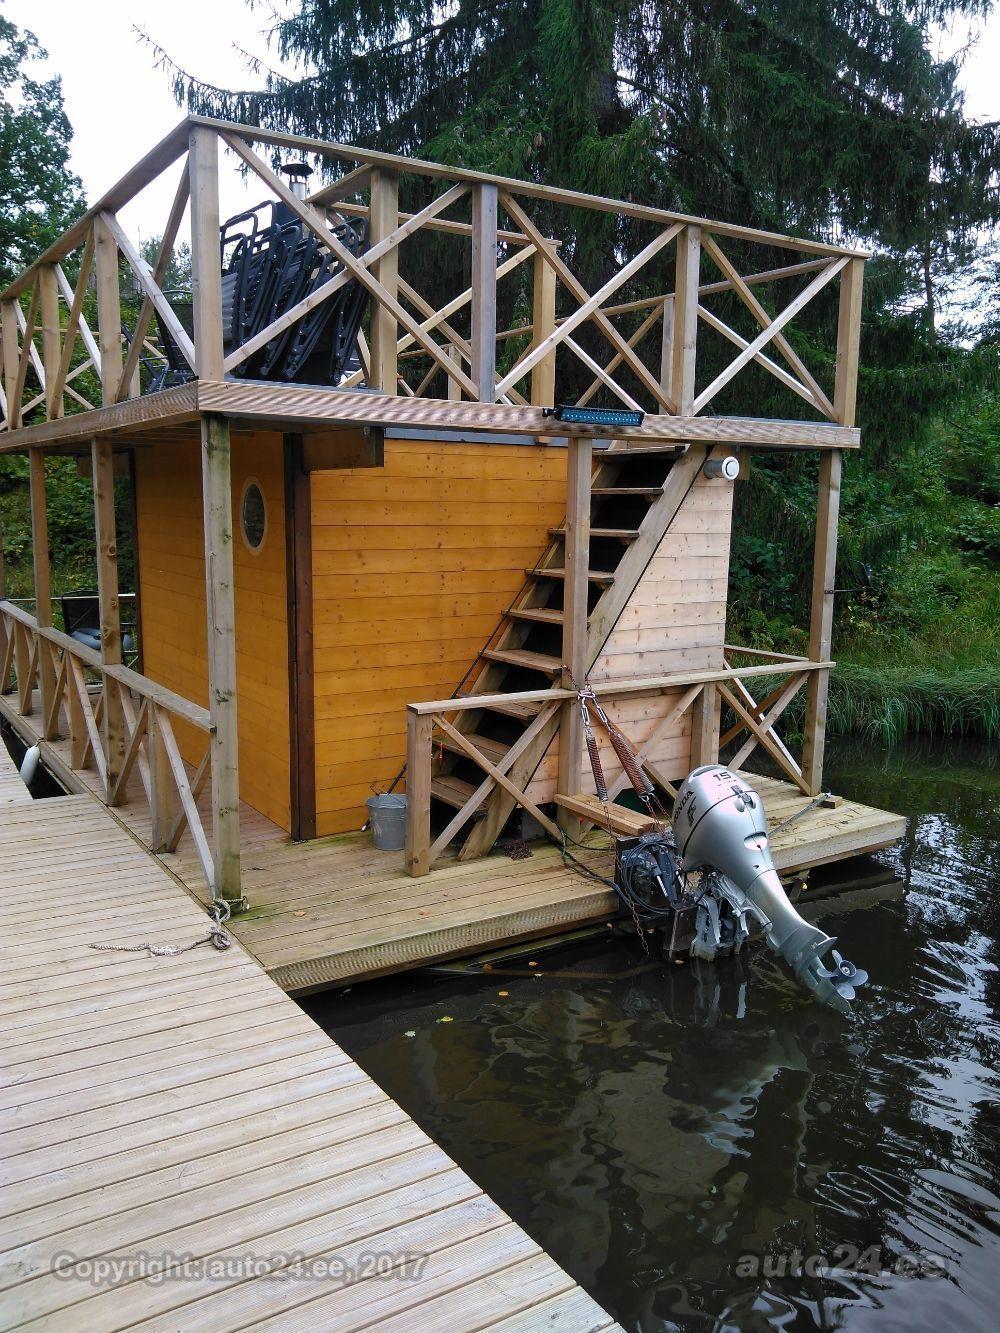 Ujuvpontoonidel saun